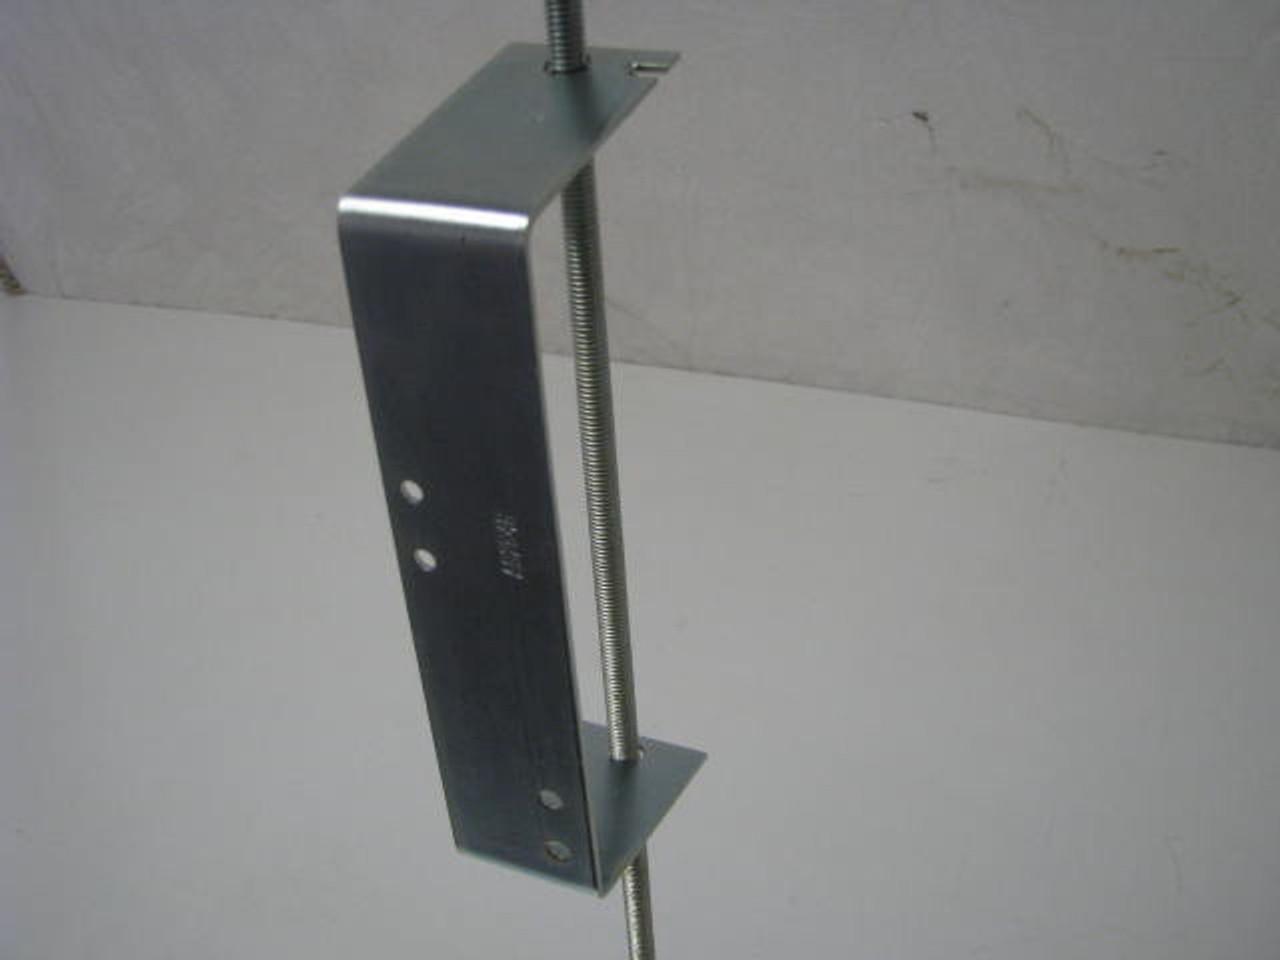 "3/8"" REGULATOR BRACKET (06-1008) SHOWN ASSEMBLED ON ROD (NOT INCLUDED)"